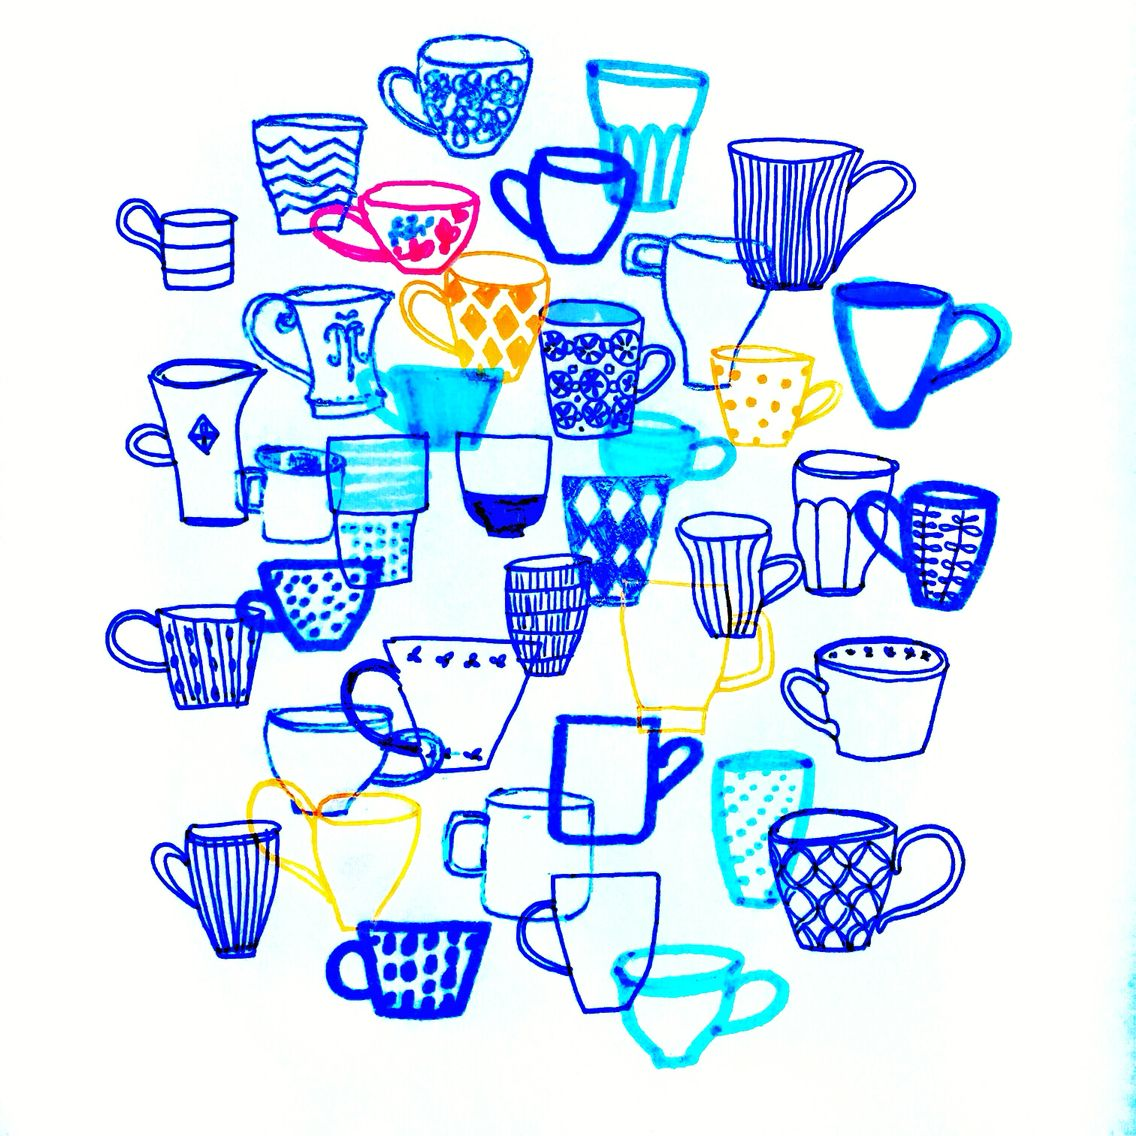 Would you like some more coffee? By Marie Åhfeldt, Mås Illustra. www.masillustra.se #coffee #cup #illustration #masillustra